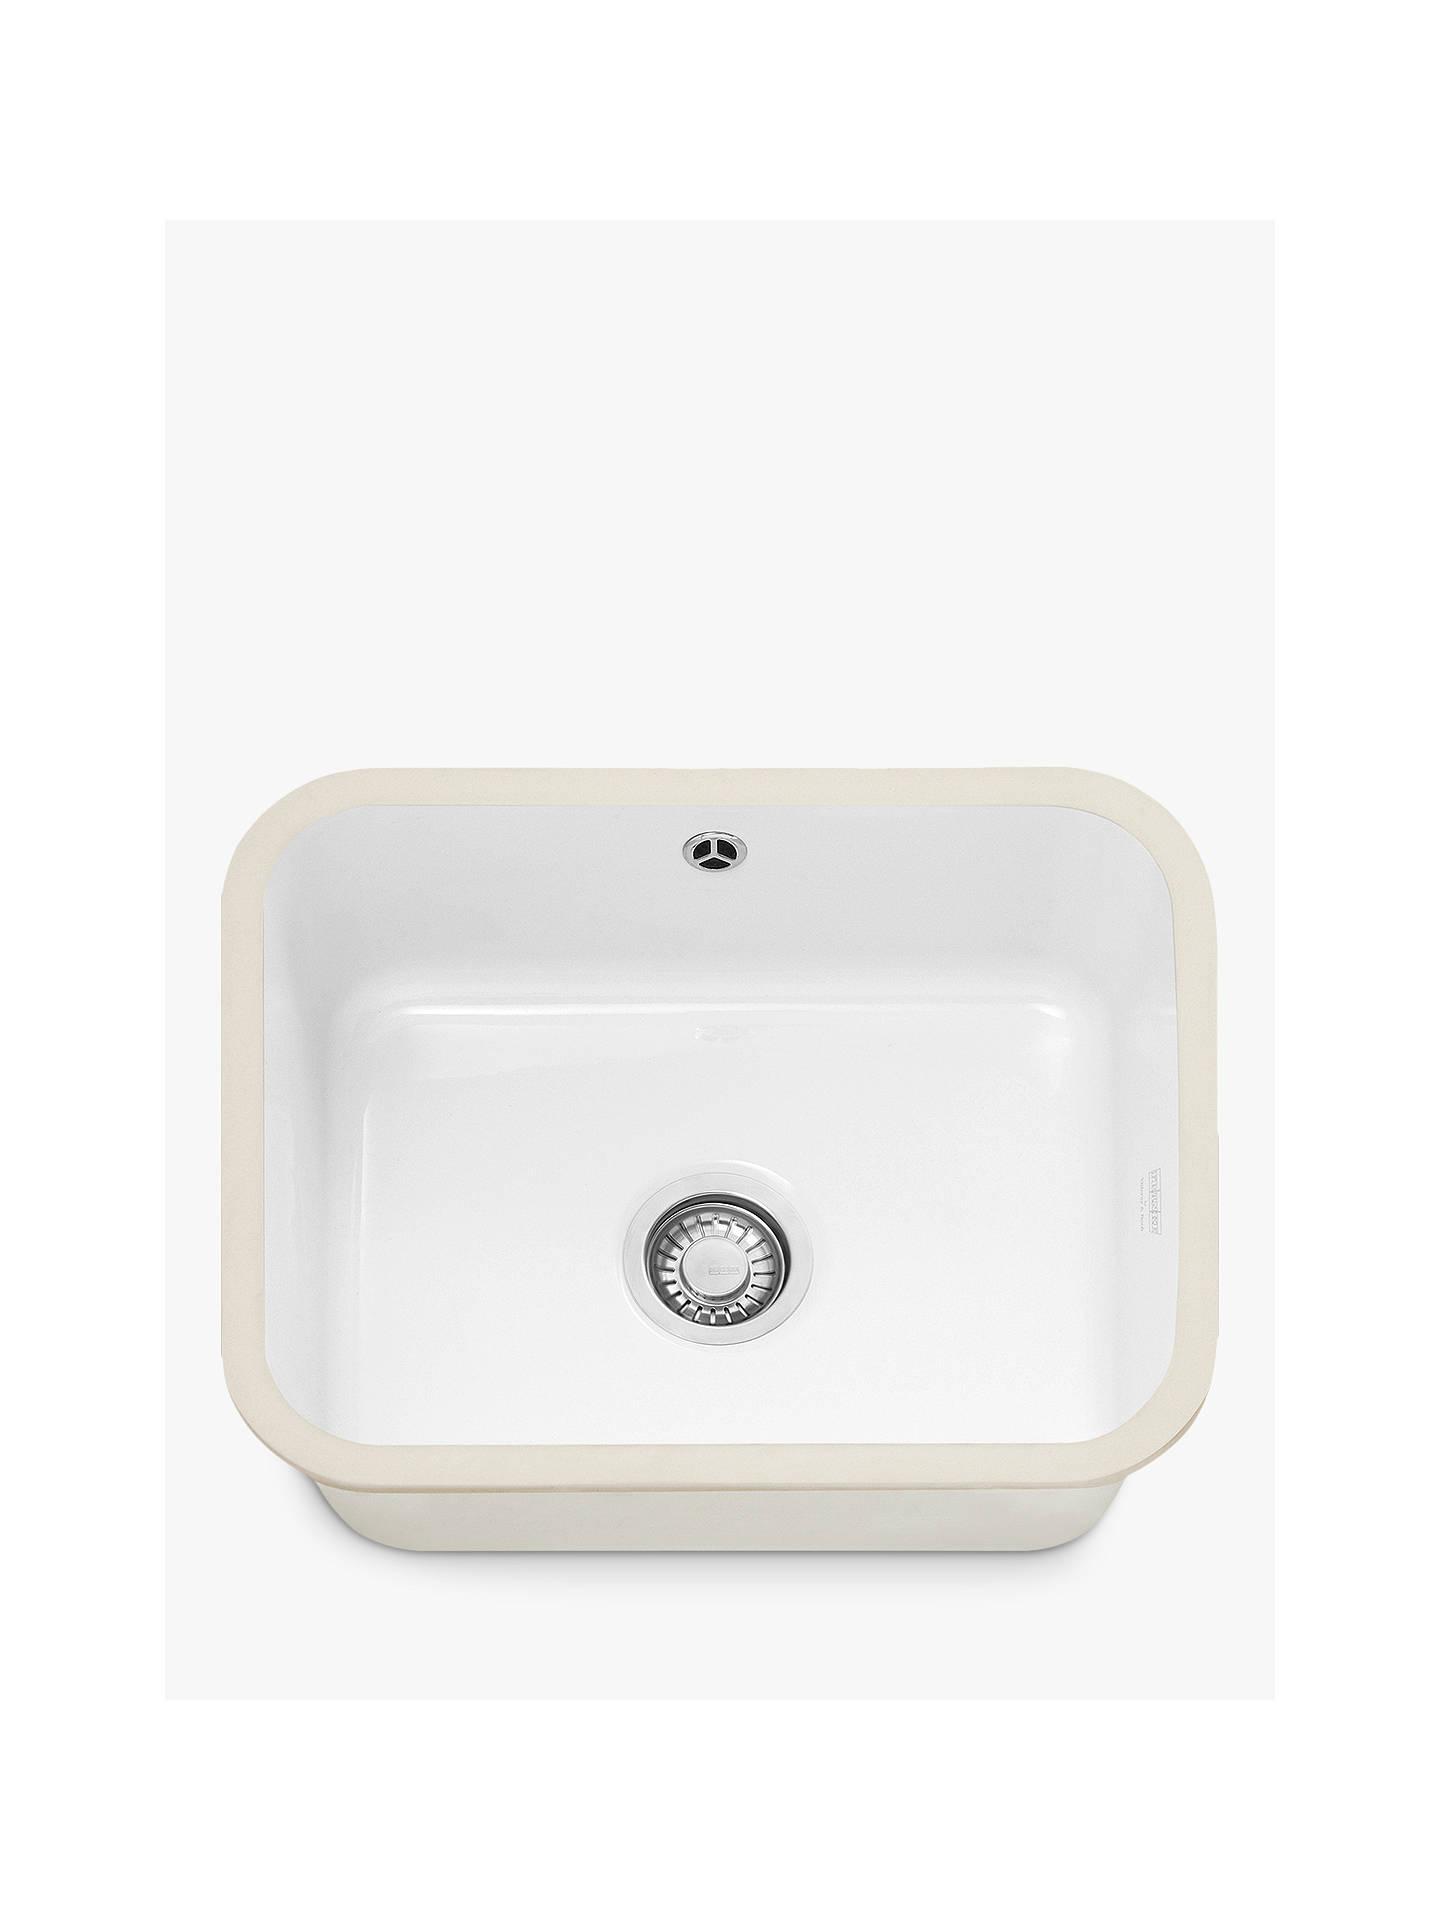 Franke VBK 110-50 Single Bowl Undermounted Ceramic Kitchen Sink ...